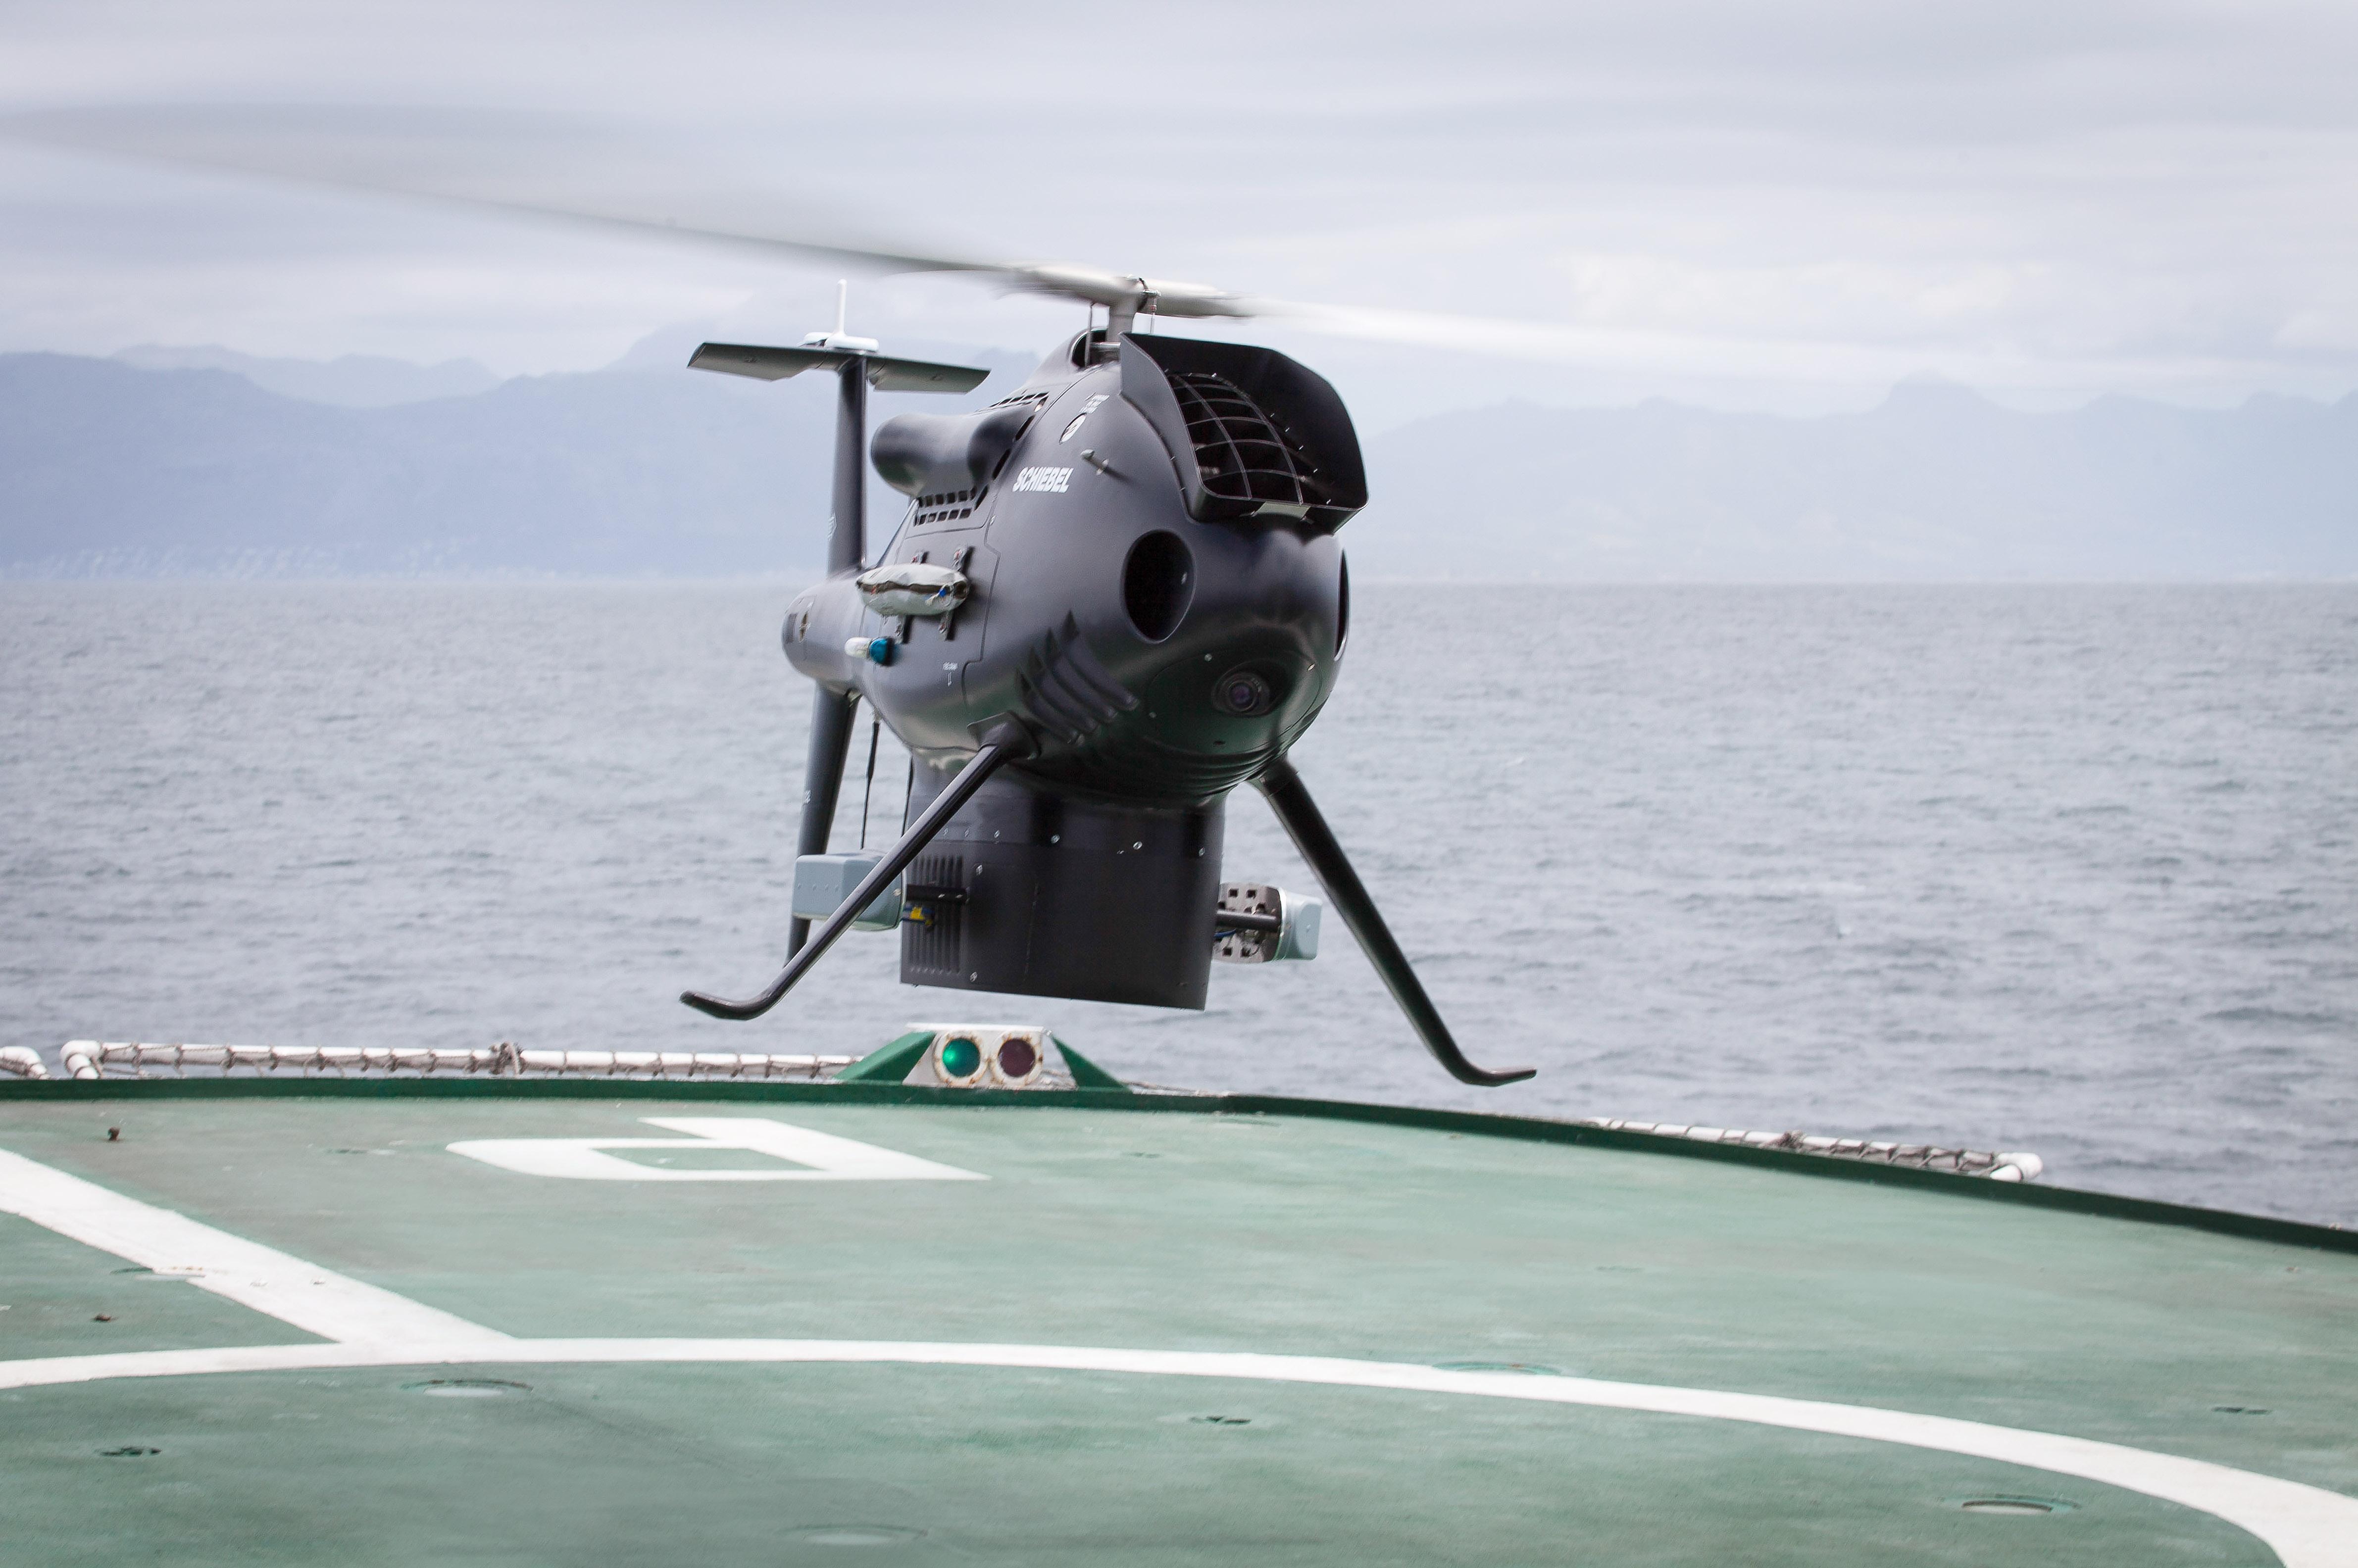 Schiebel's Camcopter S-100 UAV